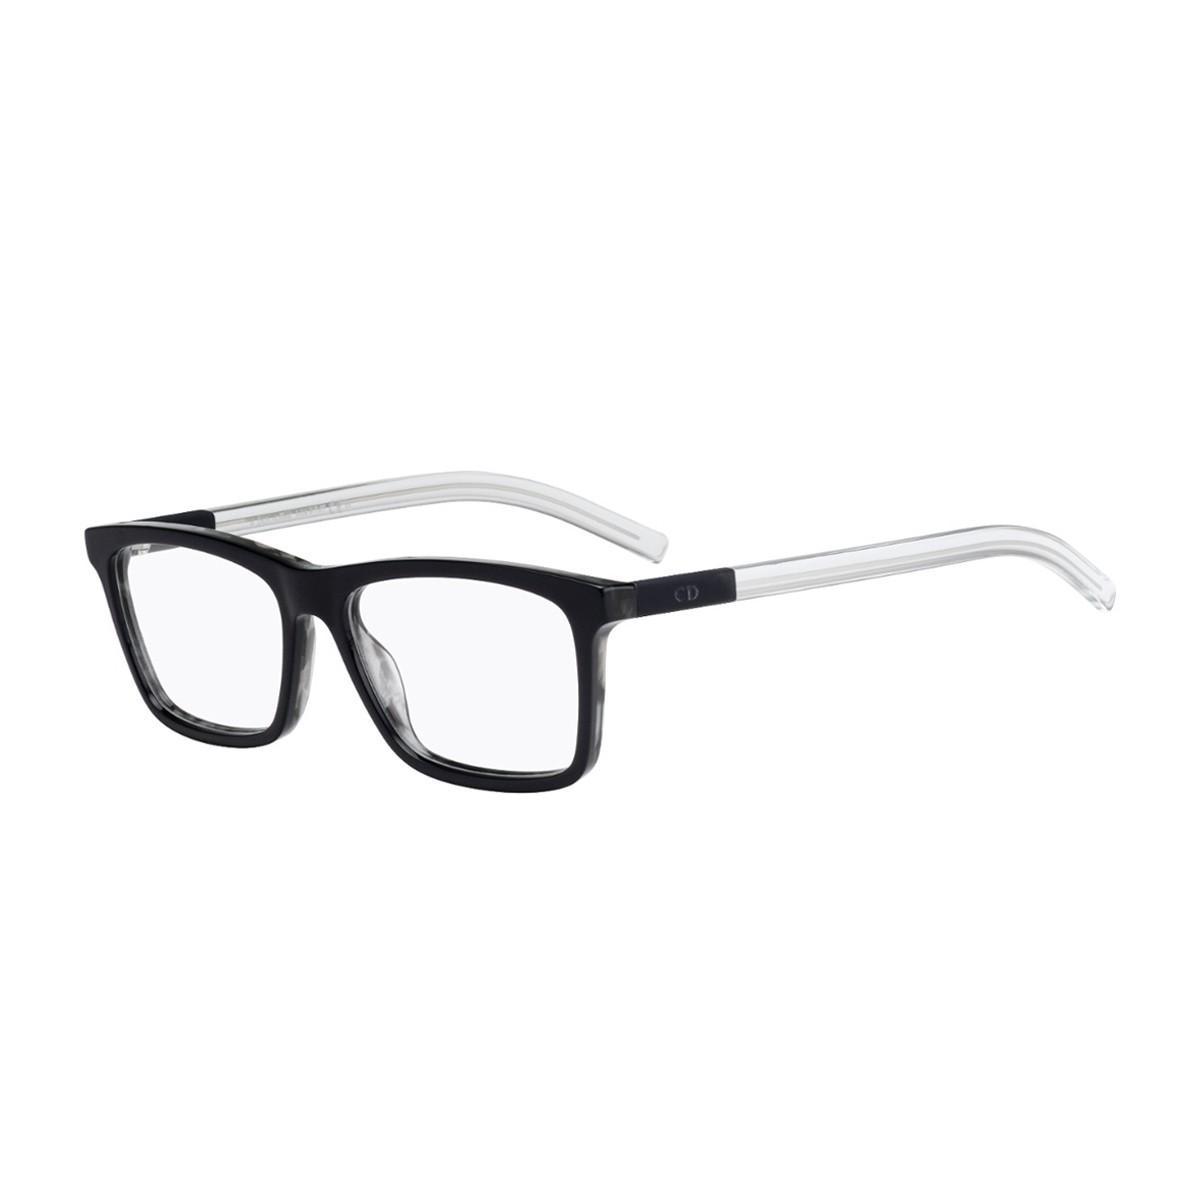 Dior Blacktie 215 | Occhiali da Vista